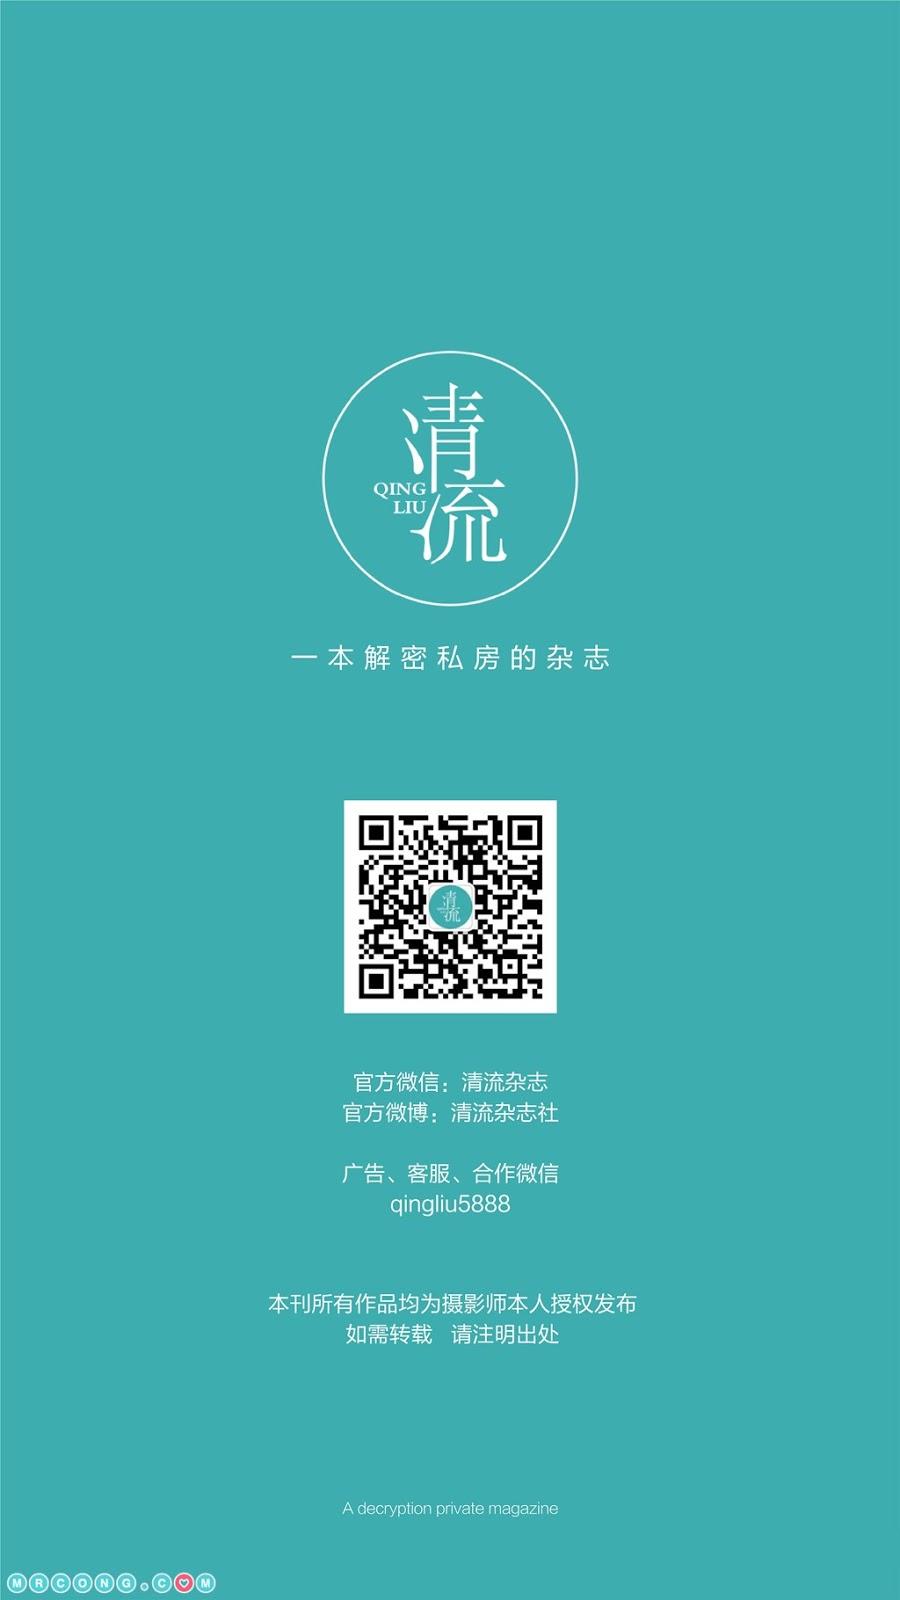 Qing Liu Magazine 2017-08-15 (95 ảnh)